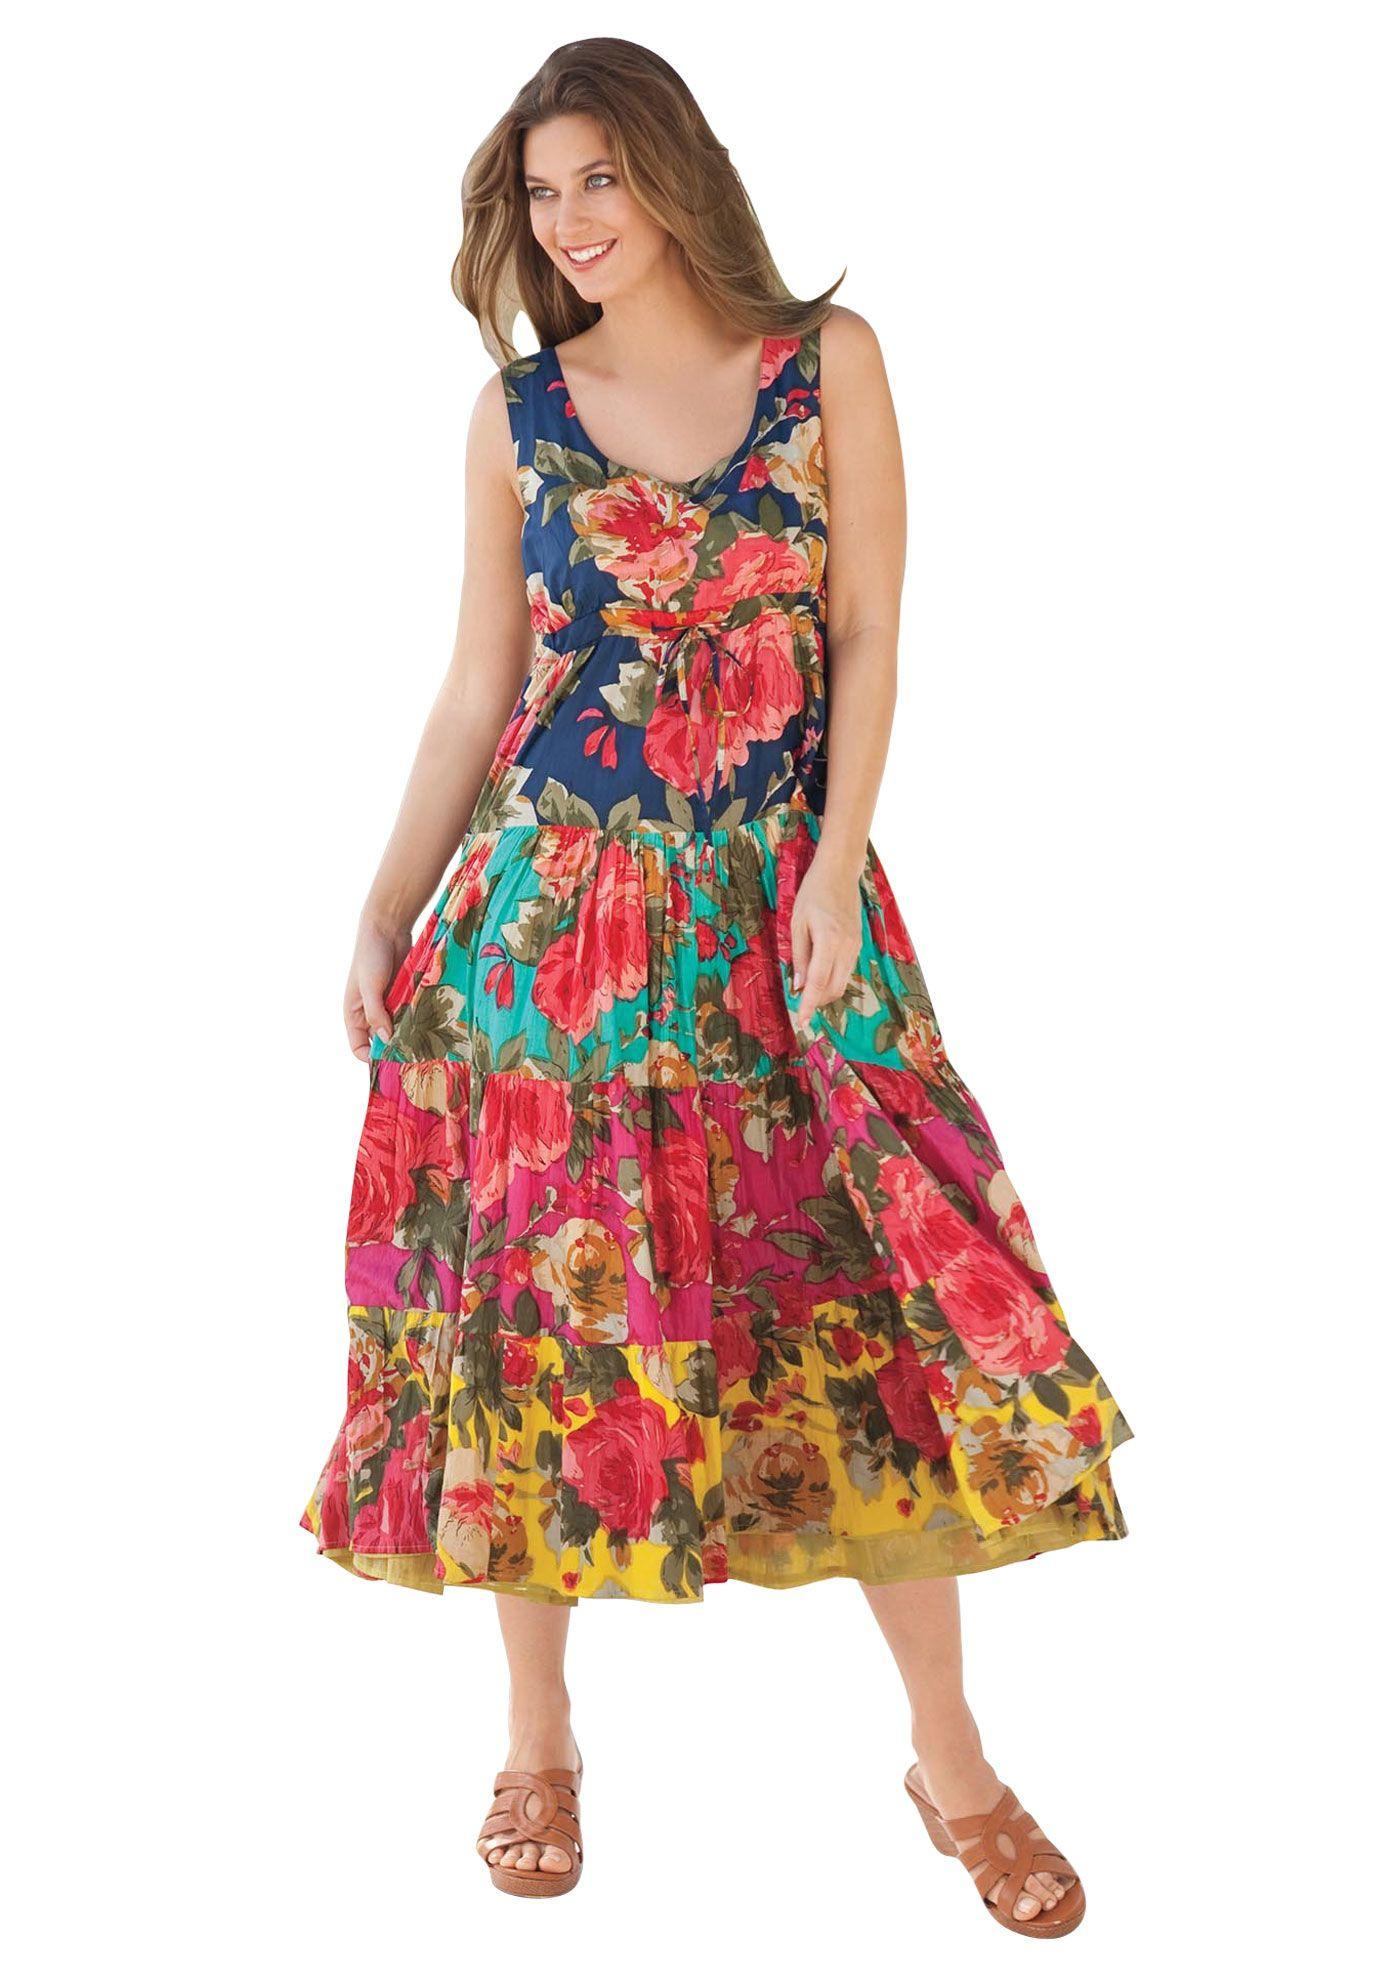 Park Art|My WordPress Blog_Strawberry Dress Plus Size Model